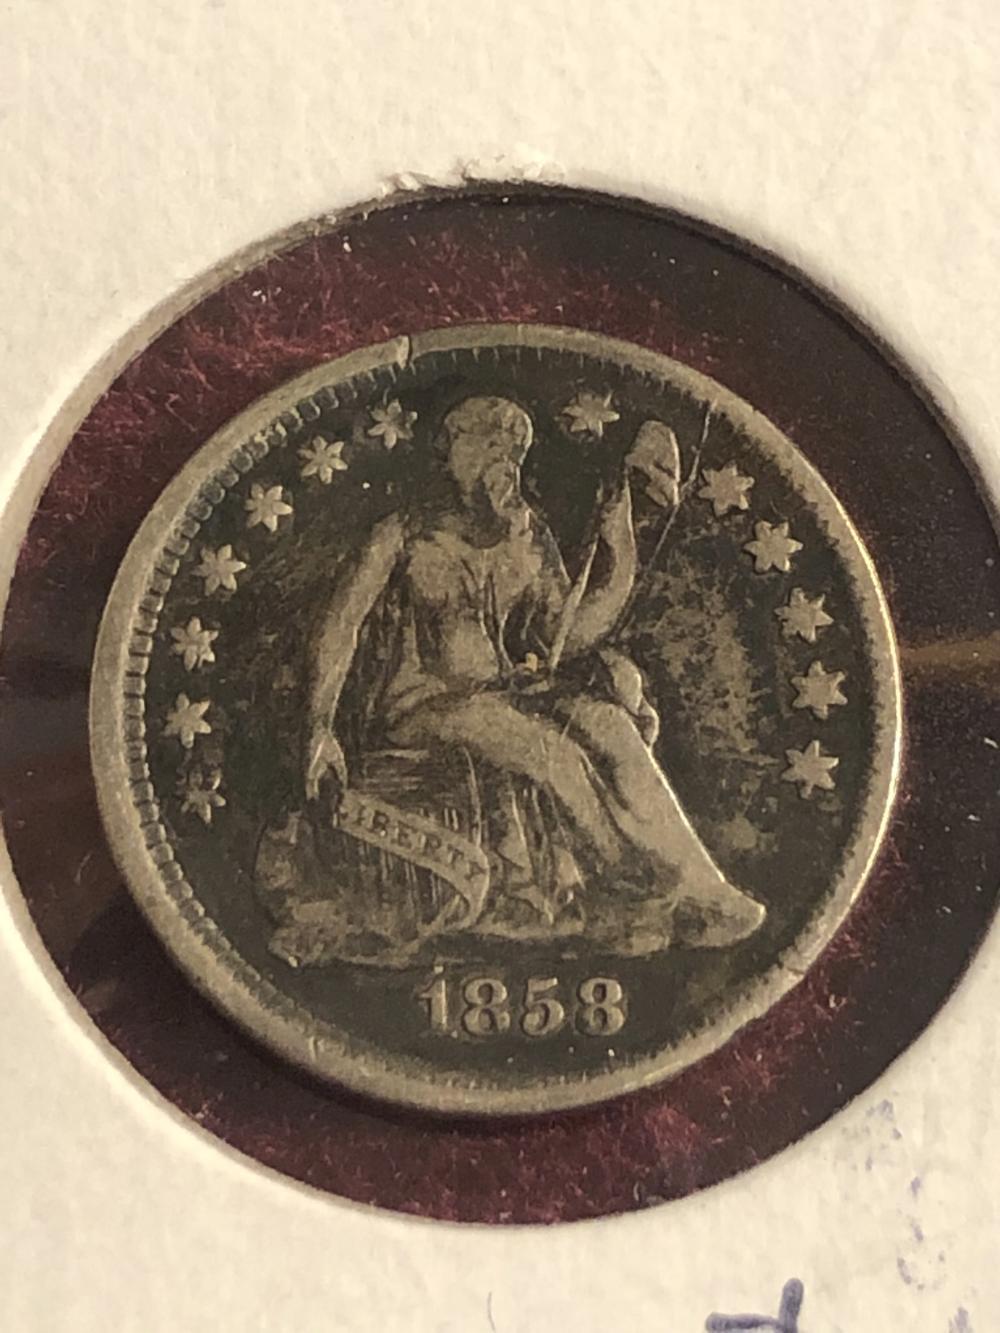 1858 U.S. half dime